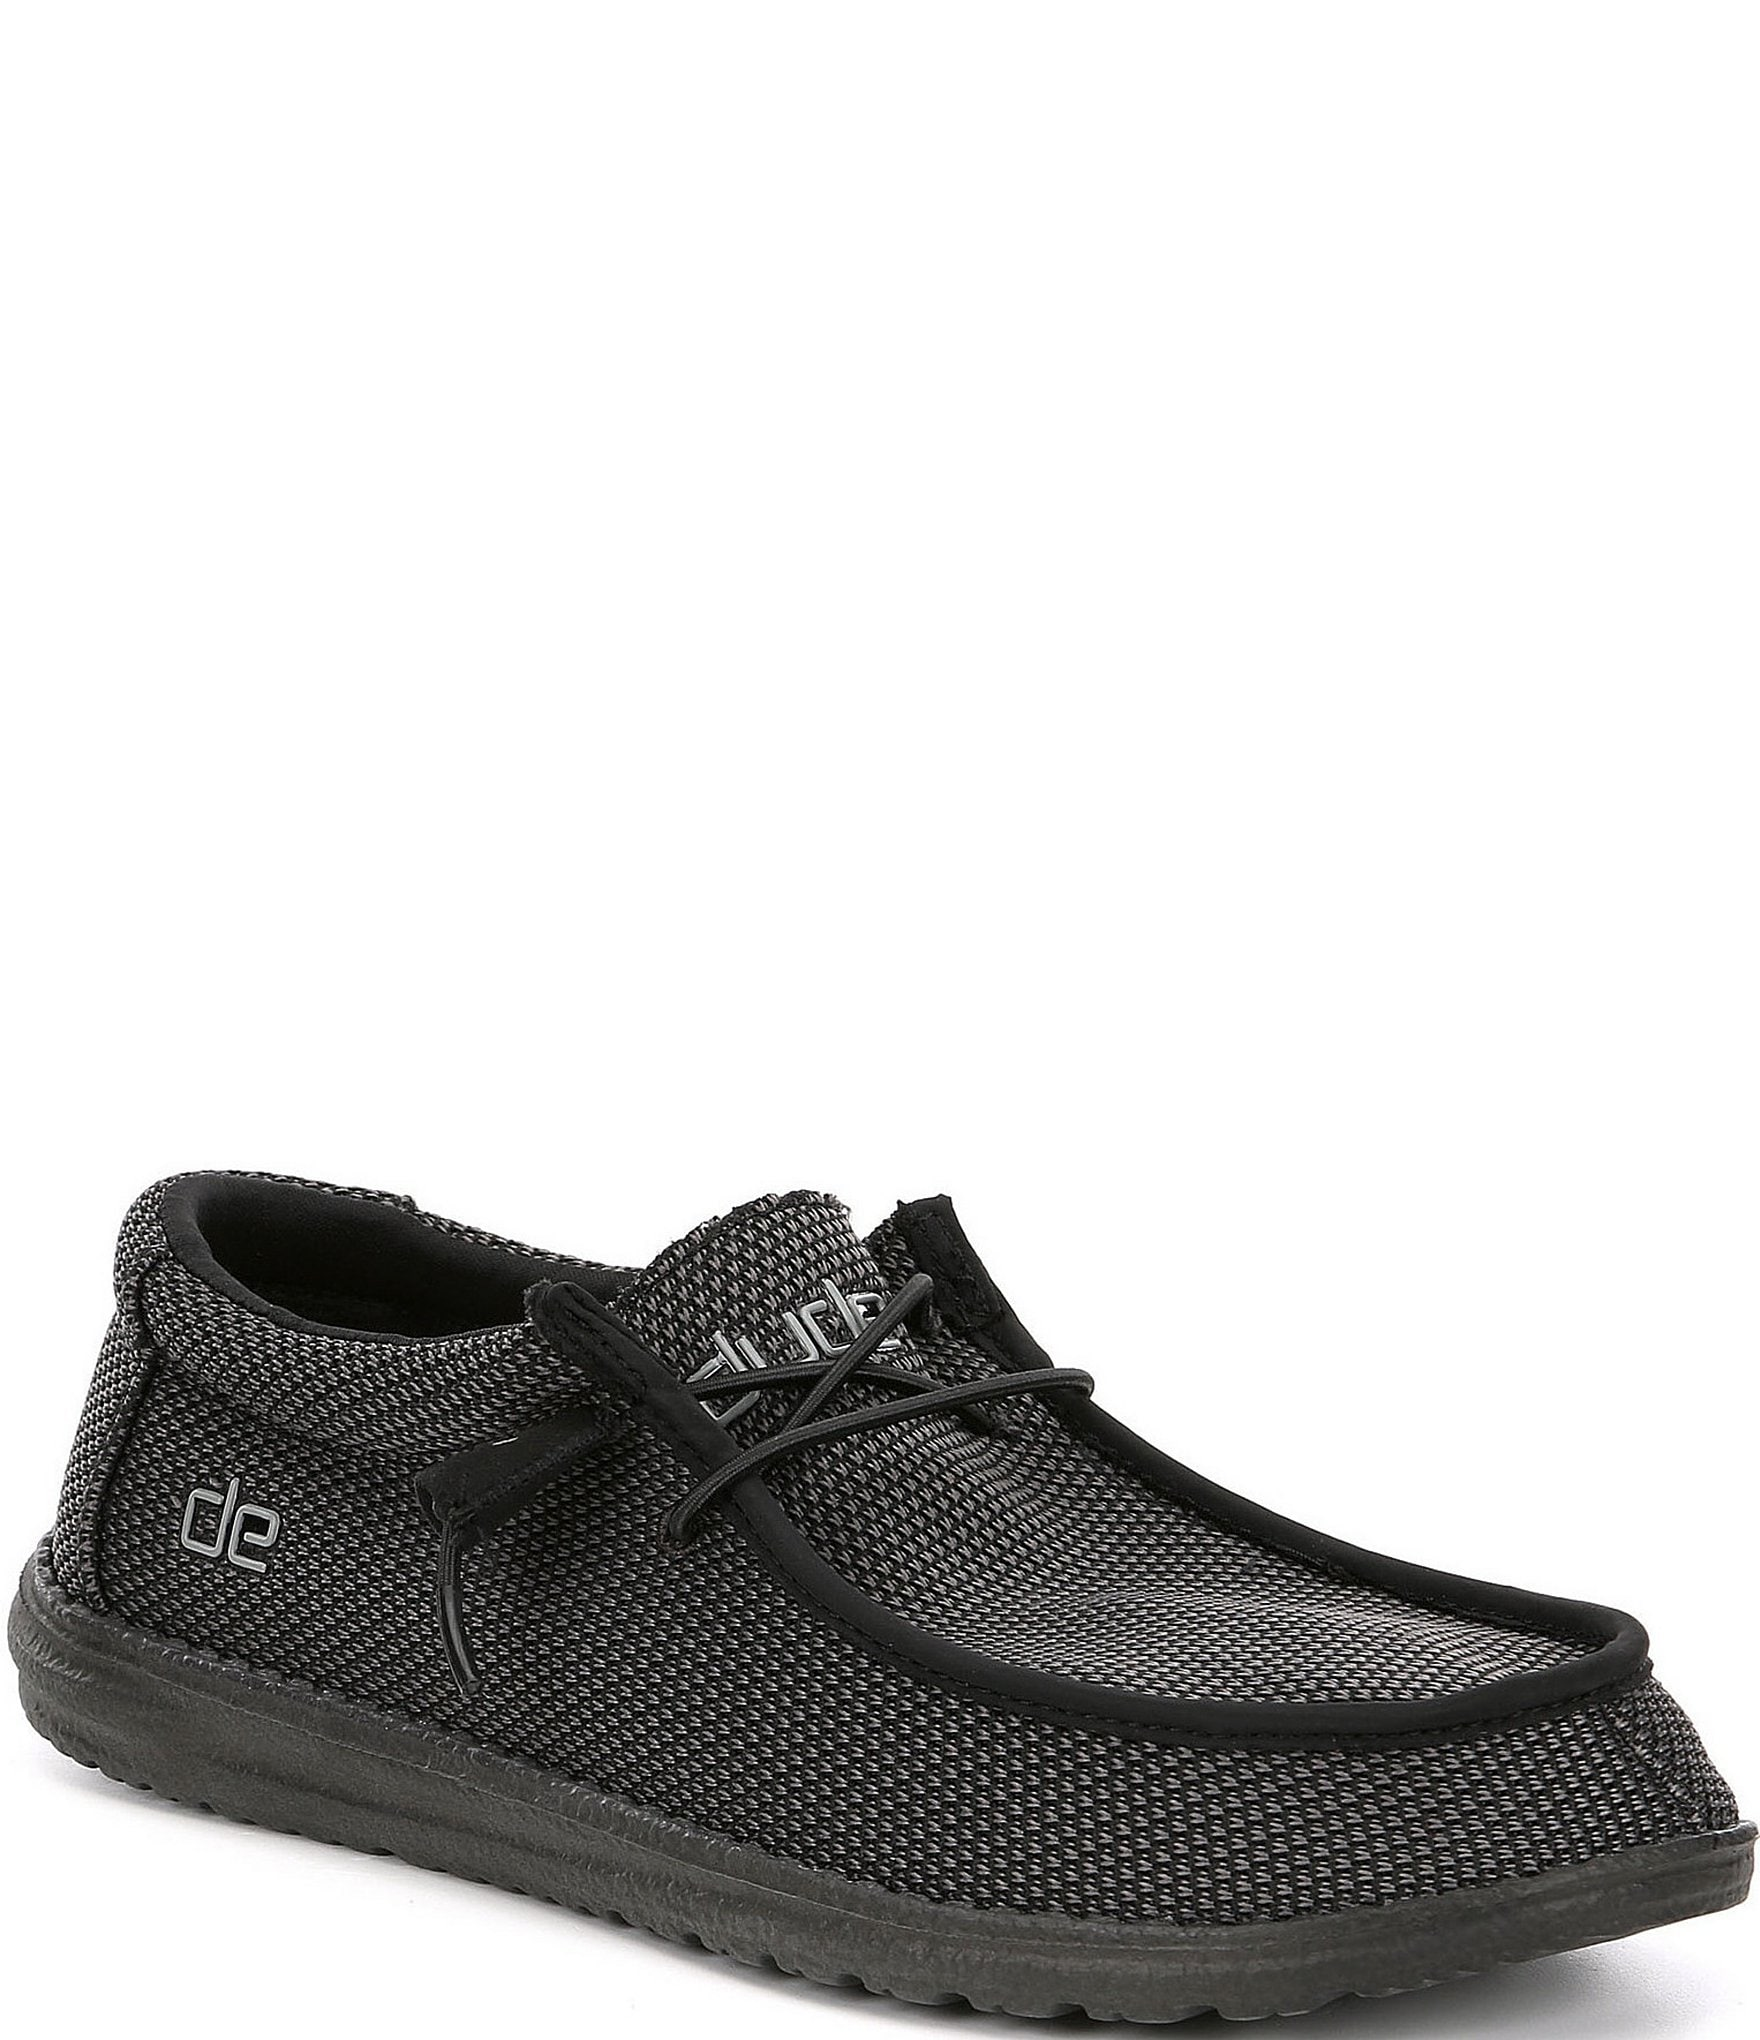 Black Hey Dude Shoes for Women, Men